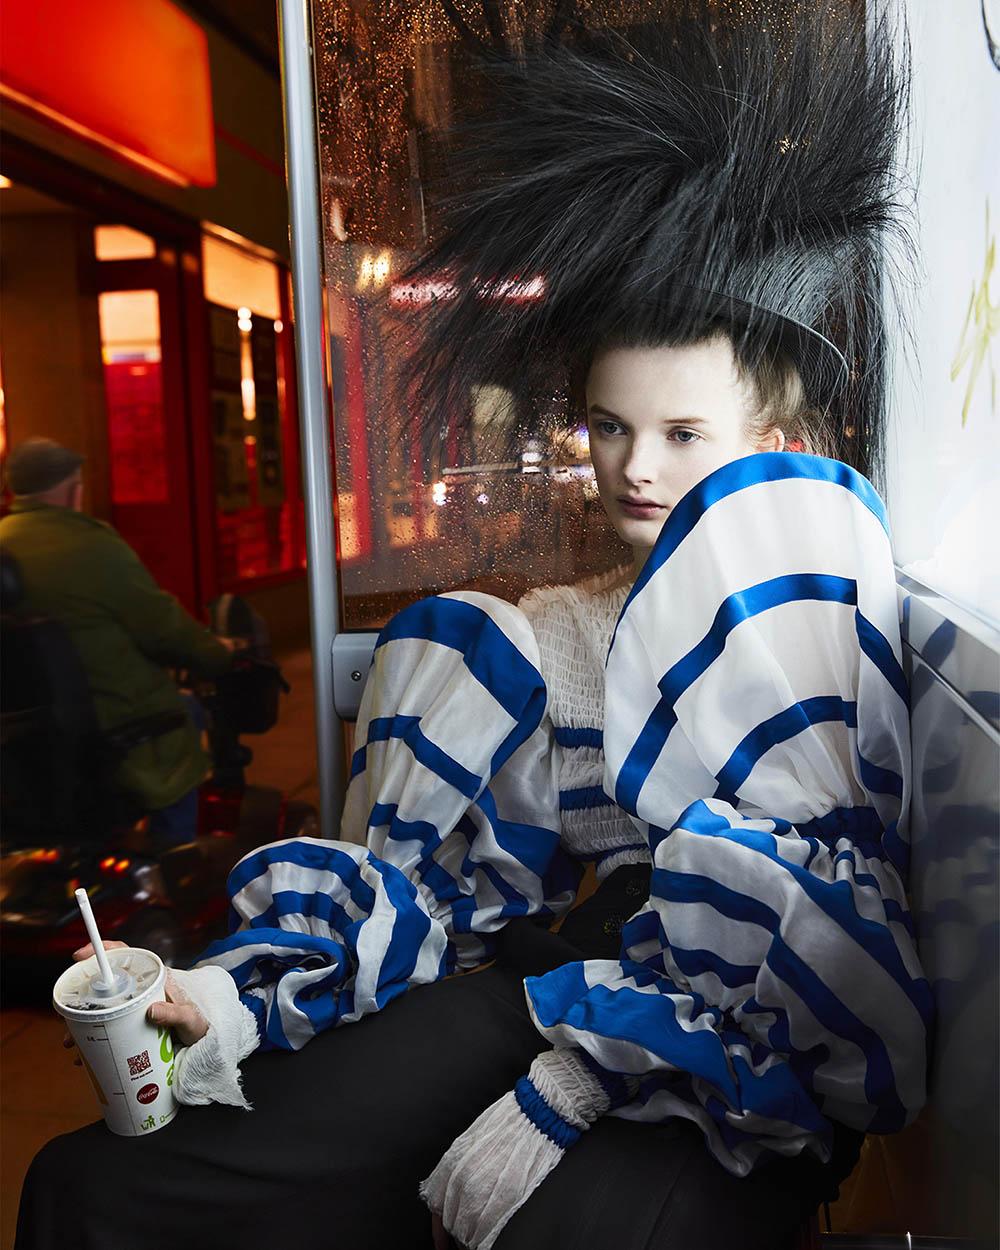 Primrose Archer by Sølve Sundsbø for V Magazine Summer 2020